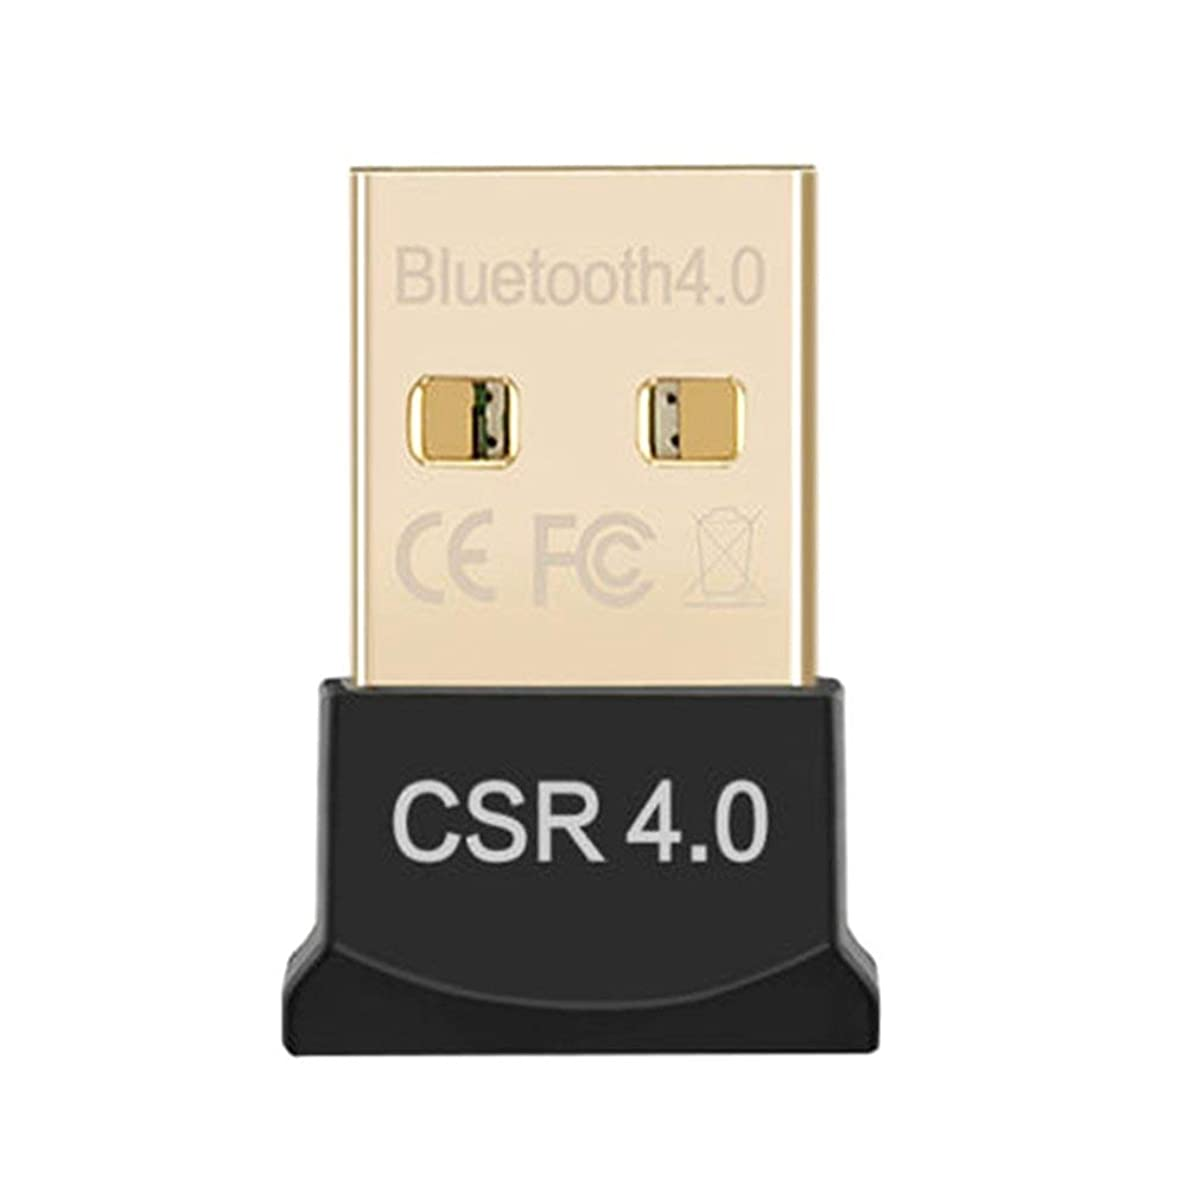 1st market プレミアム Bluetooth USB Version 4.0 USBアダプタ USBレシーバー Bluetoothアダプタ ドングルusb受信機 無線 通信 WindowsXP/Windows10/Windows8/Windows7/Vistaに対応(Macに非対応) 便利